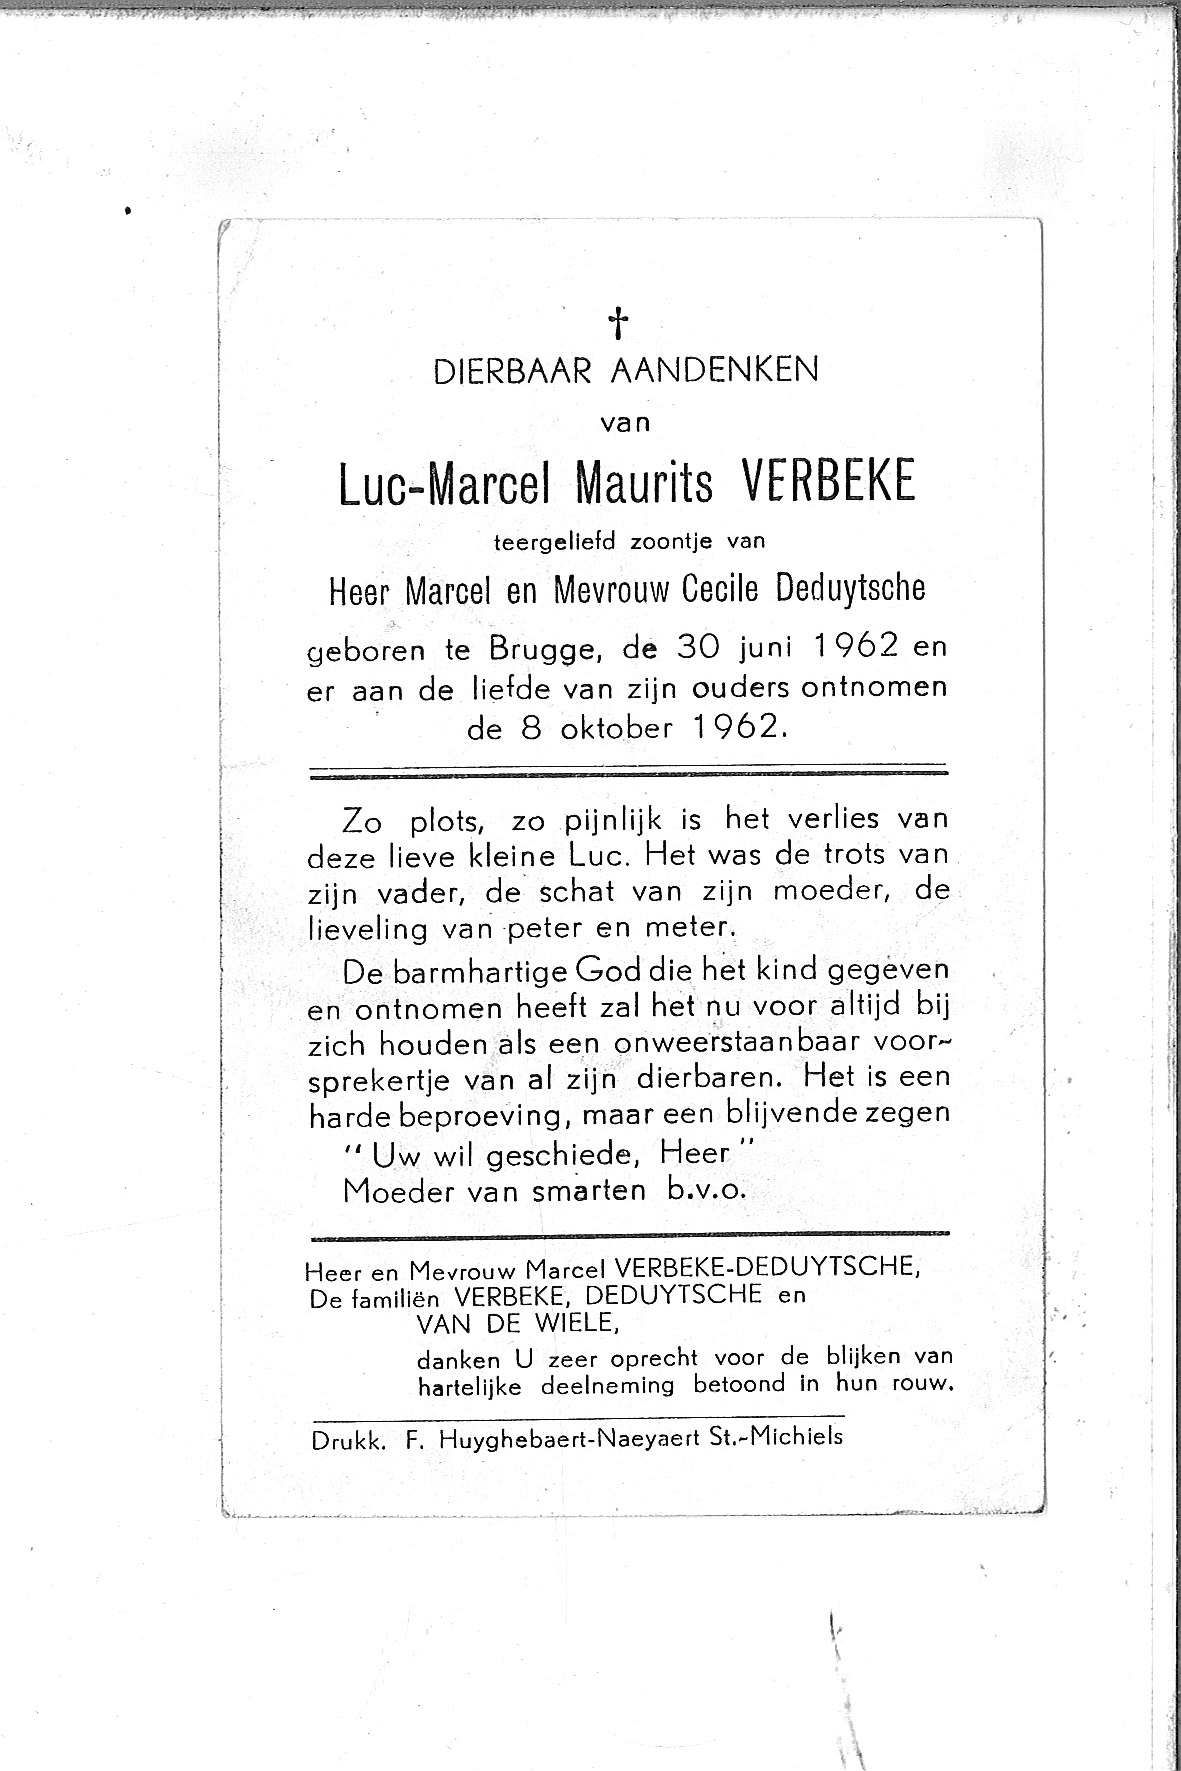 Luc-Marcel-Maurits(1962)20140623105348_00051.jpg